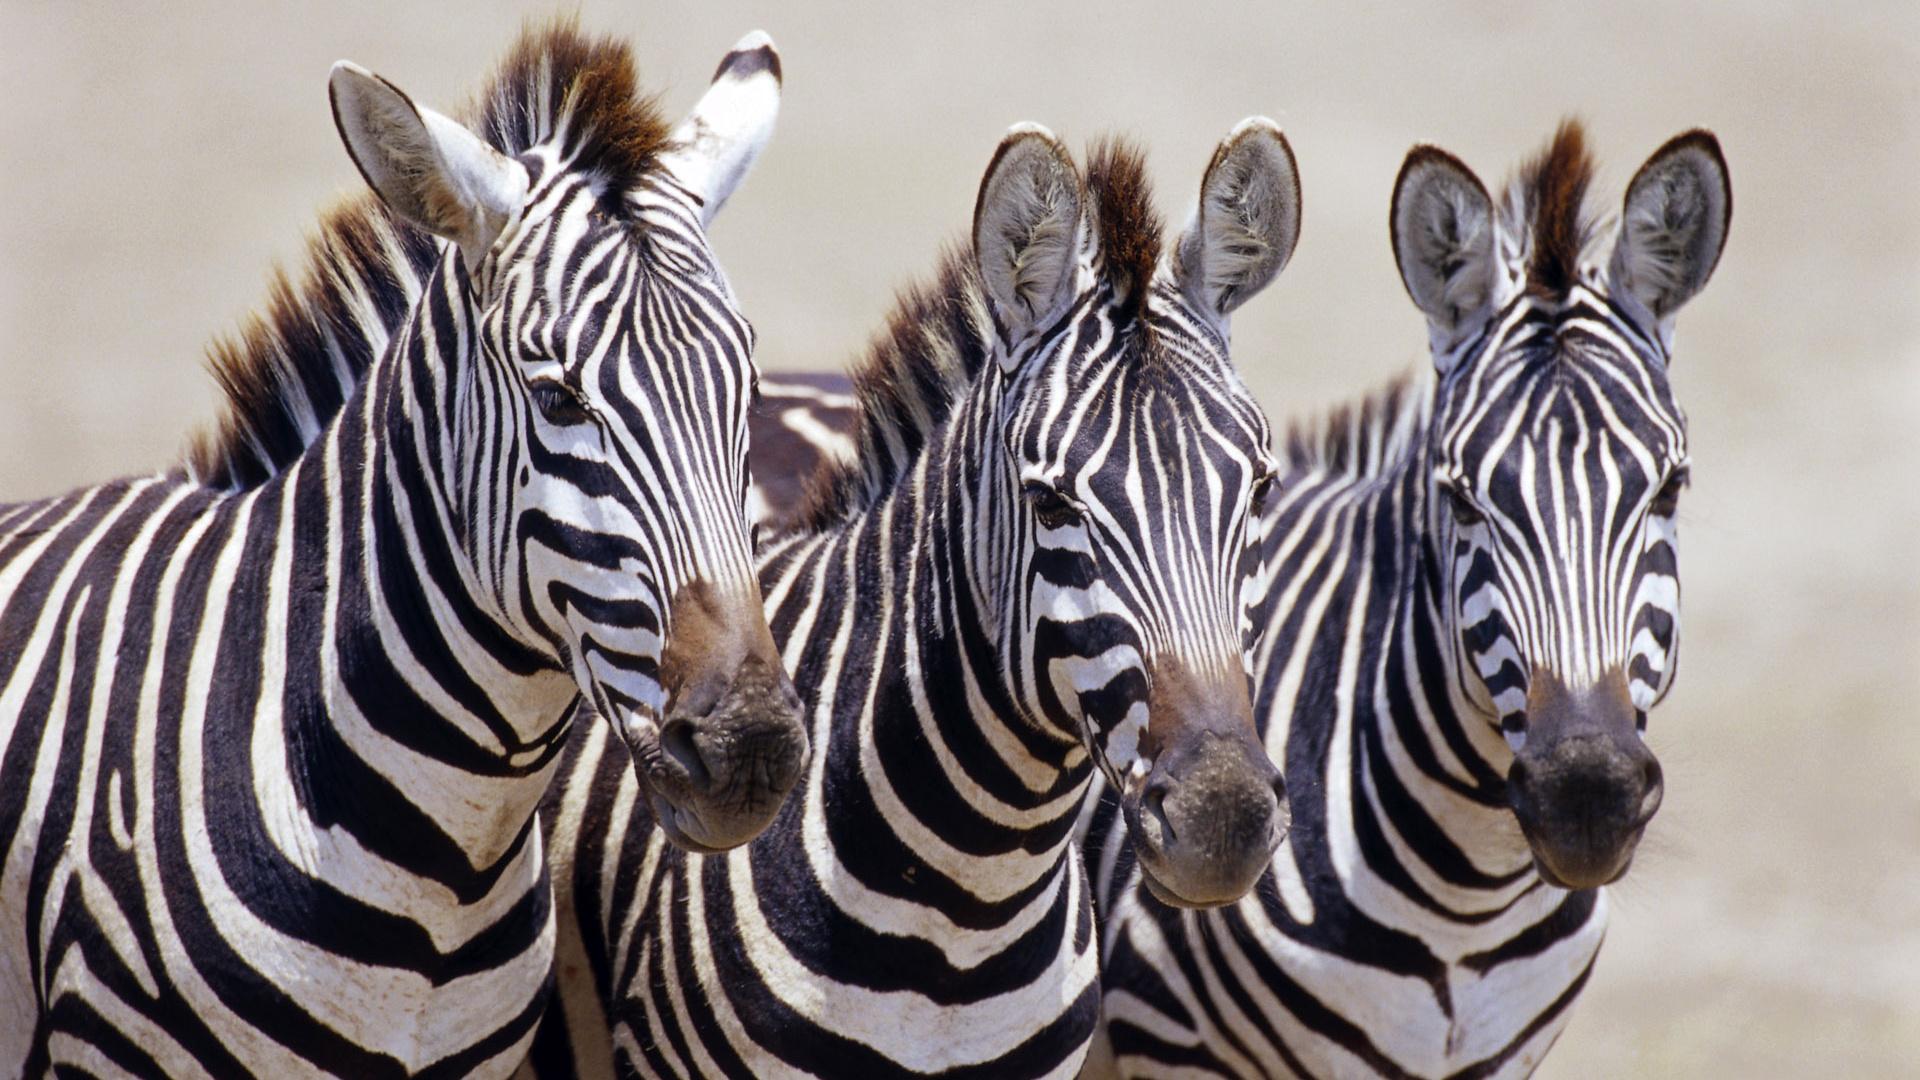 Stripes black white afrika tiere tiere foto 1920x1080 animals